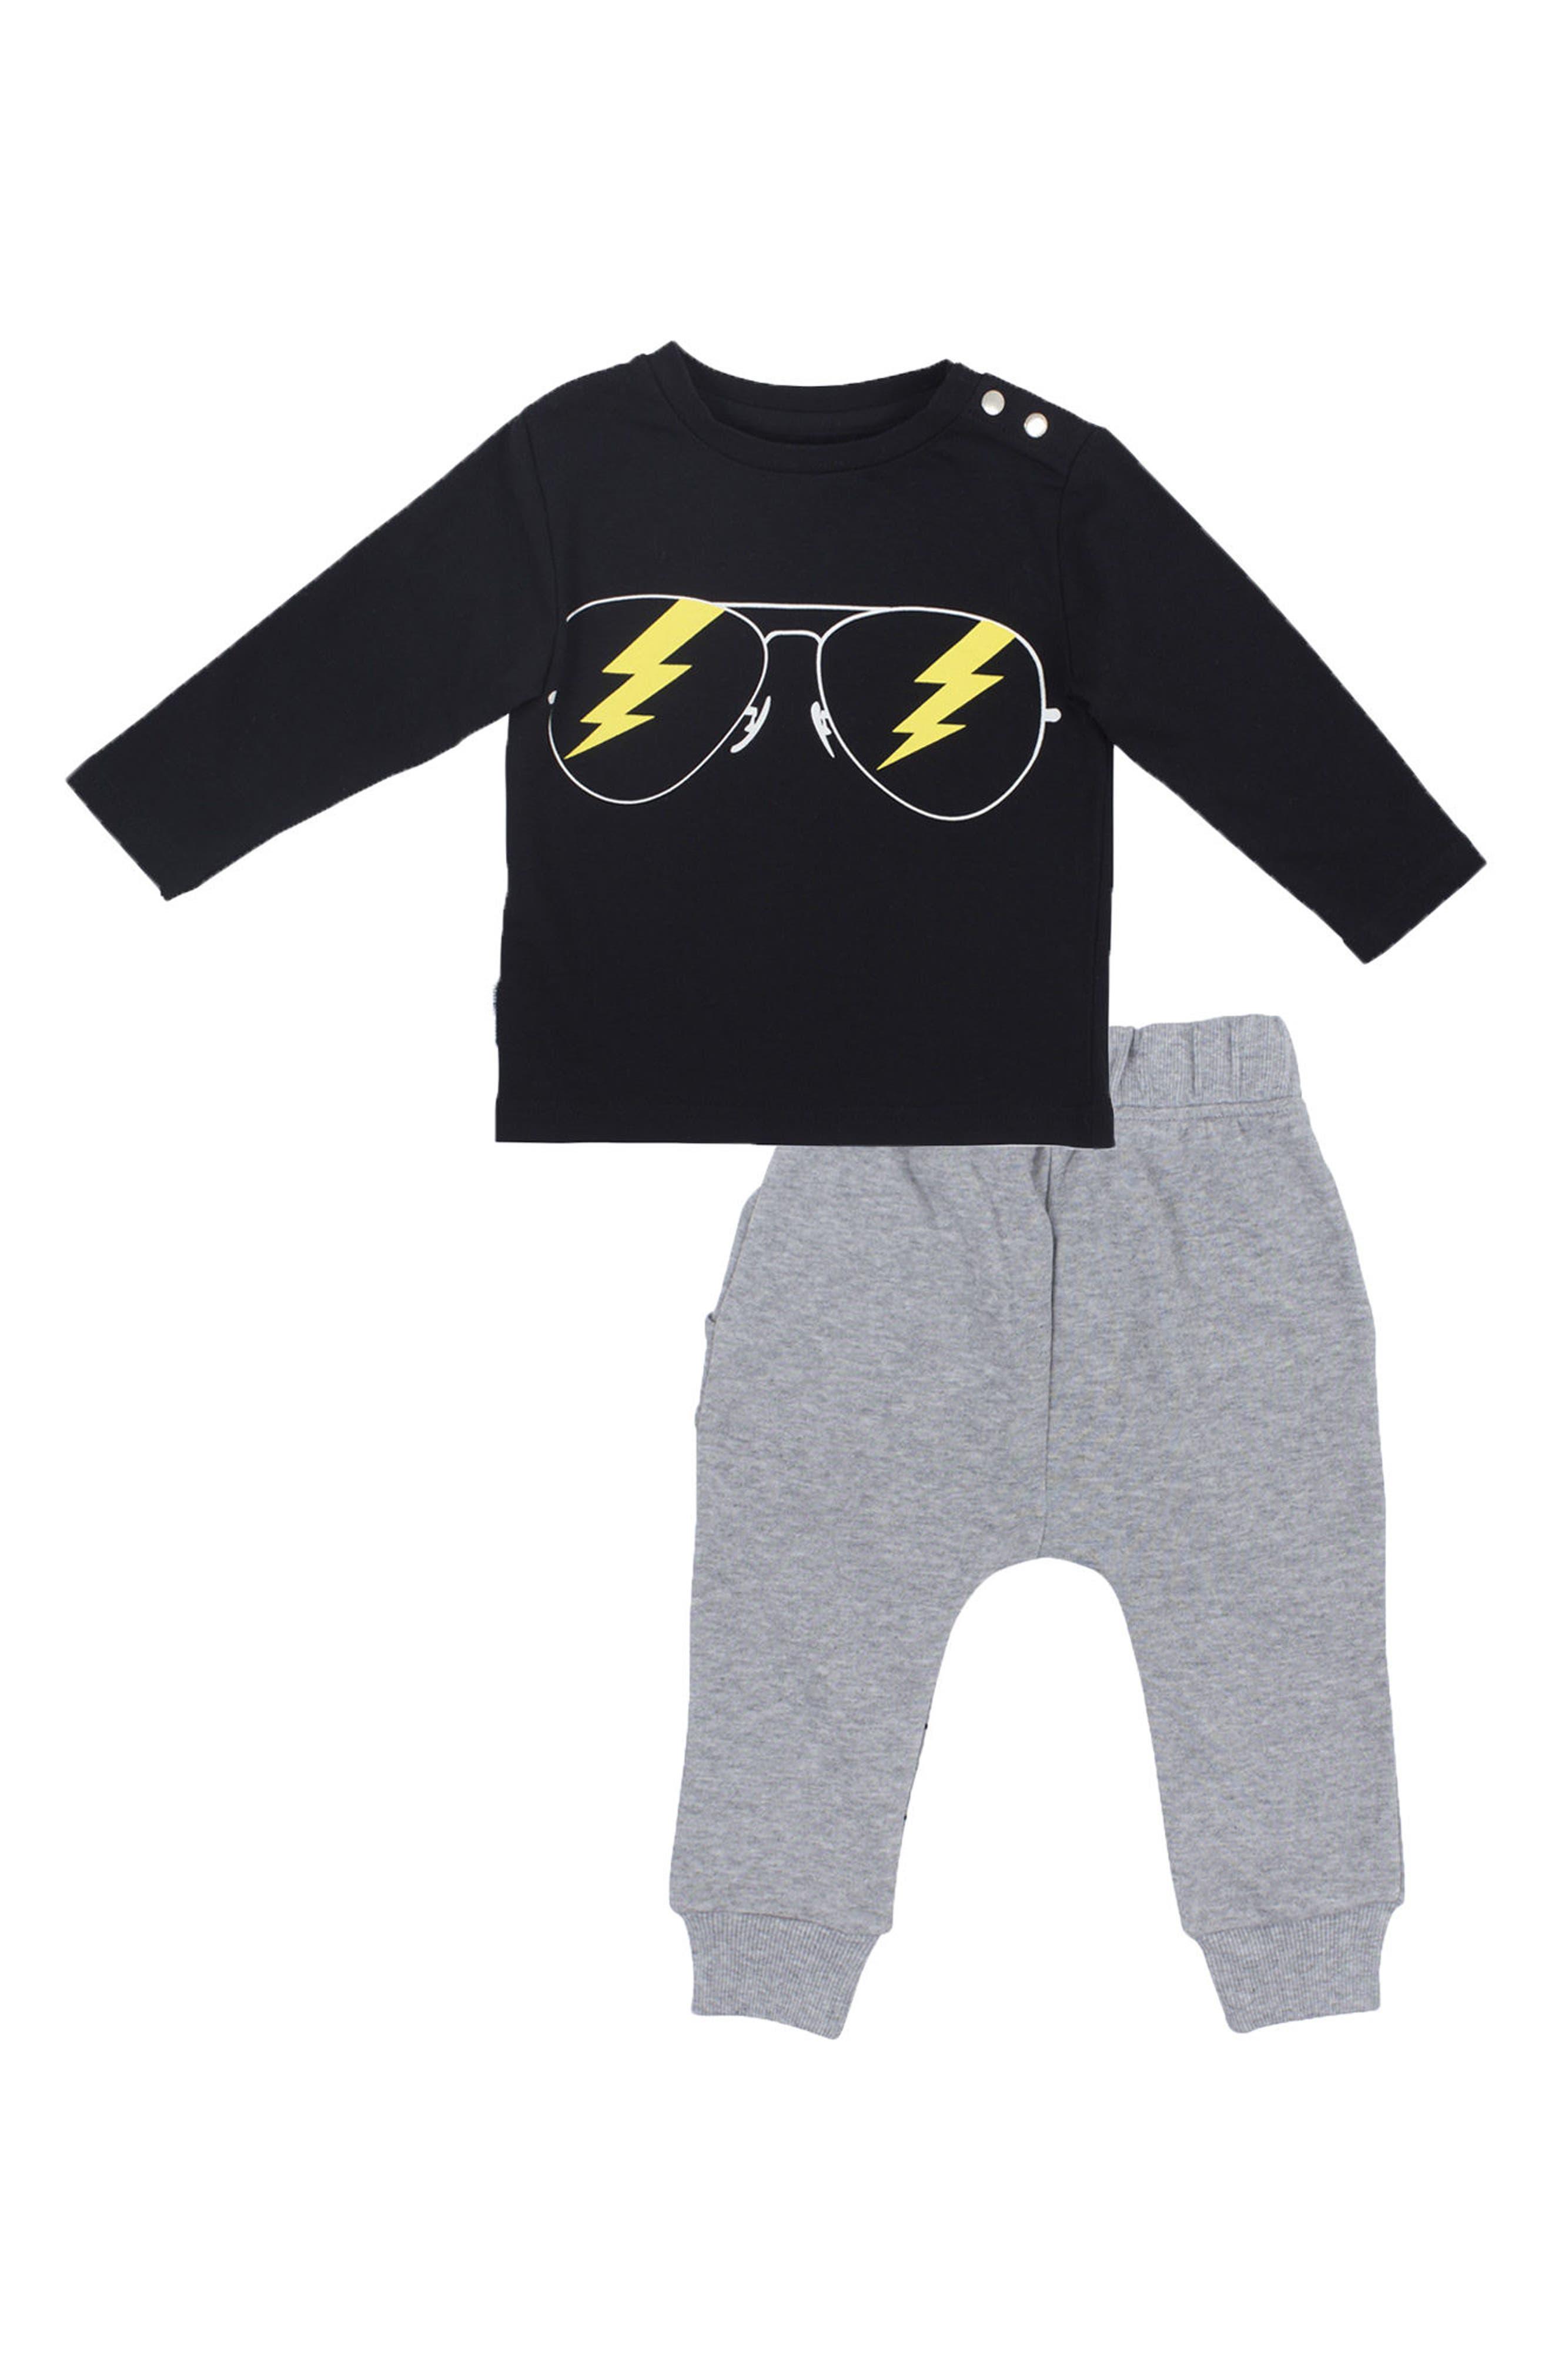 Main Image - Tiny Tribe Rockstar T-Shirt & Jogger Pants Set (Baby)